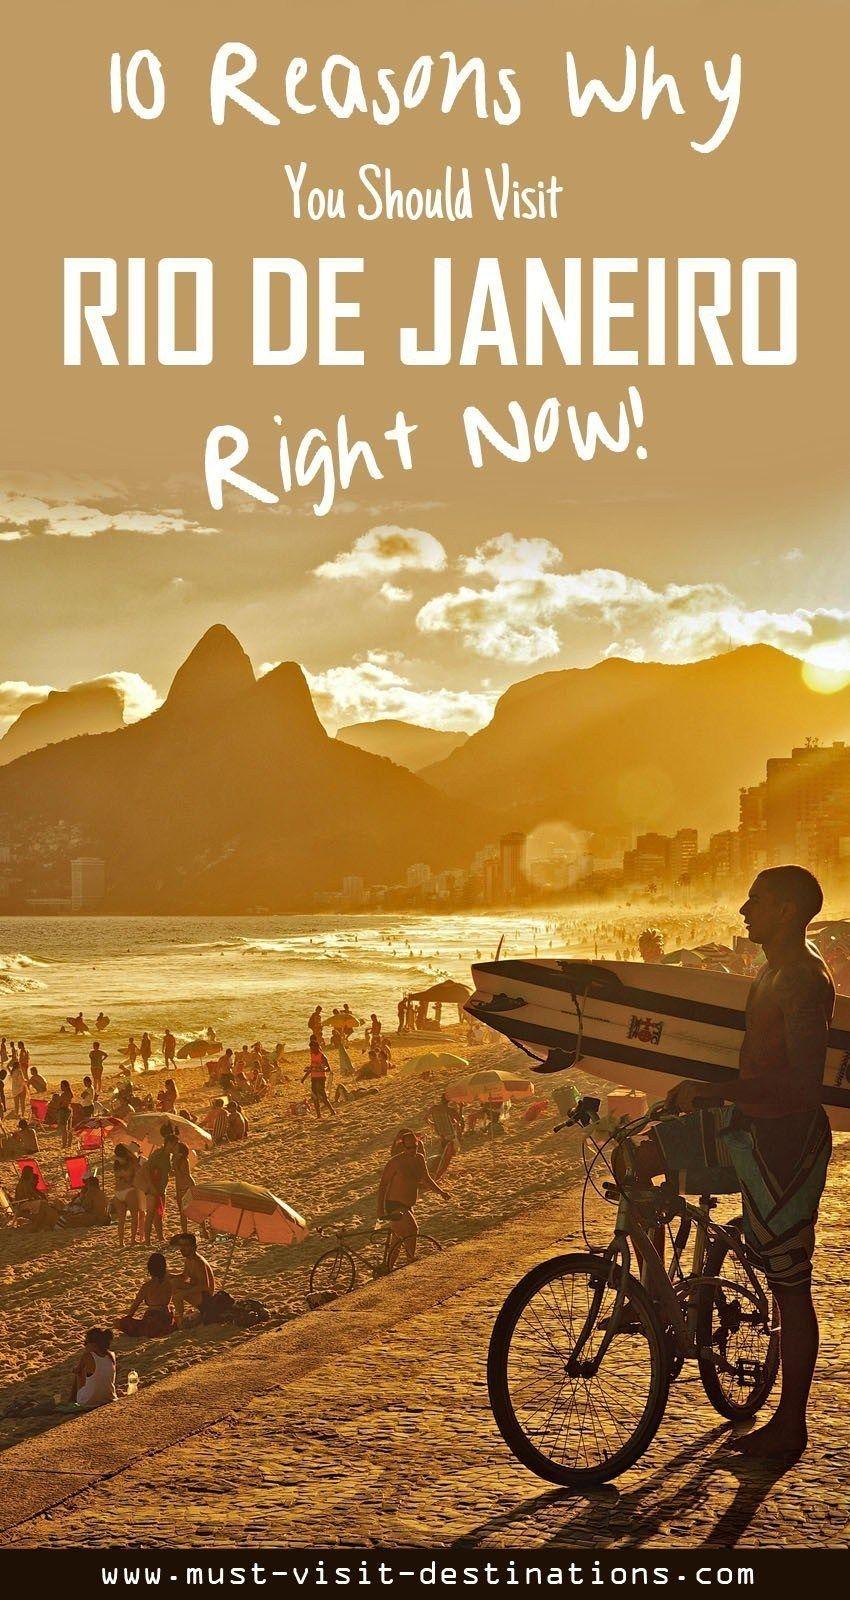 10 Reasons Why You Should Visit Rio De Janeiro Right Now Culture Travel Visit Rio Rio Culture Travel